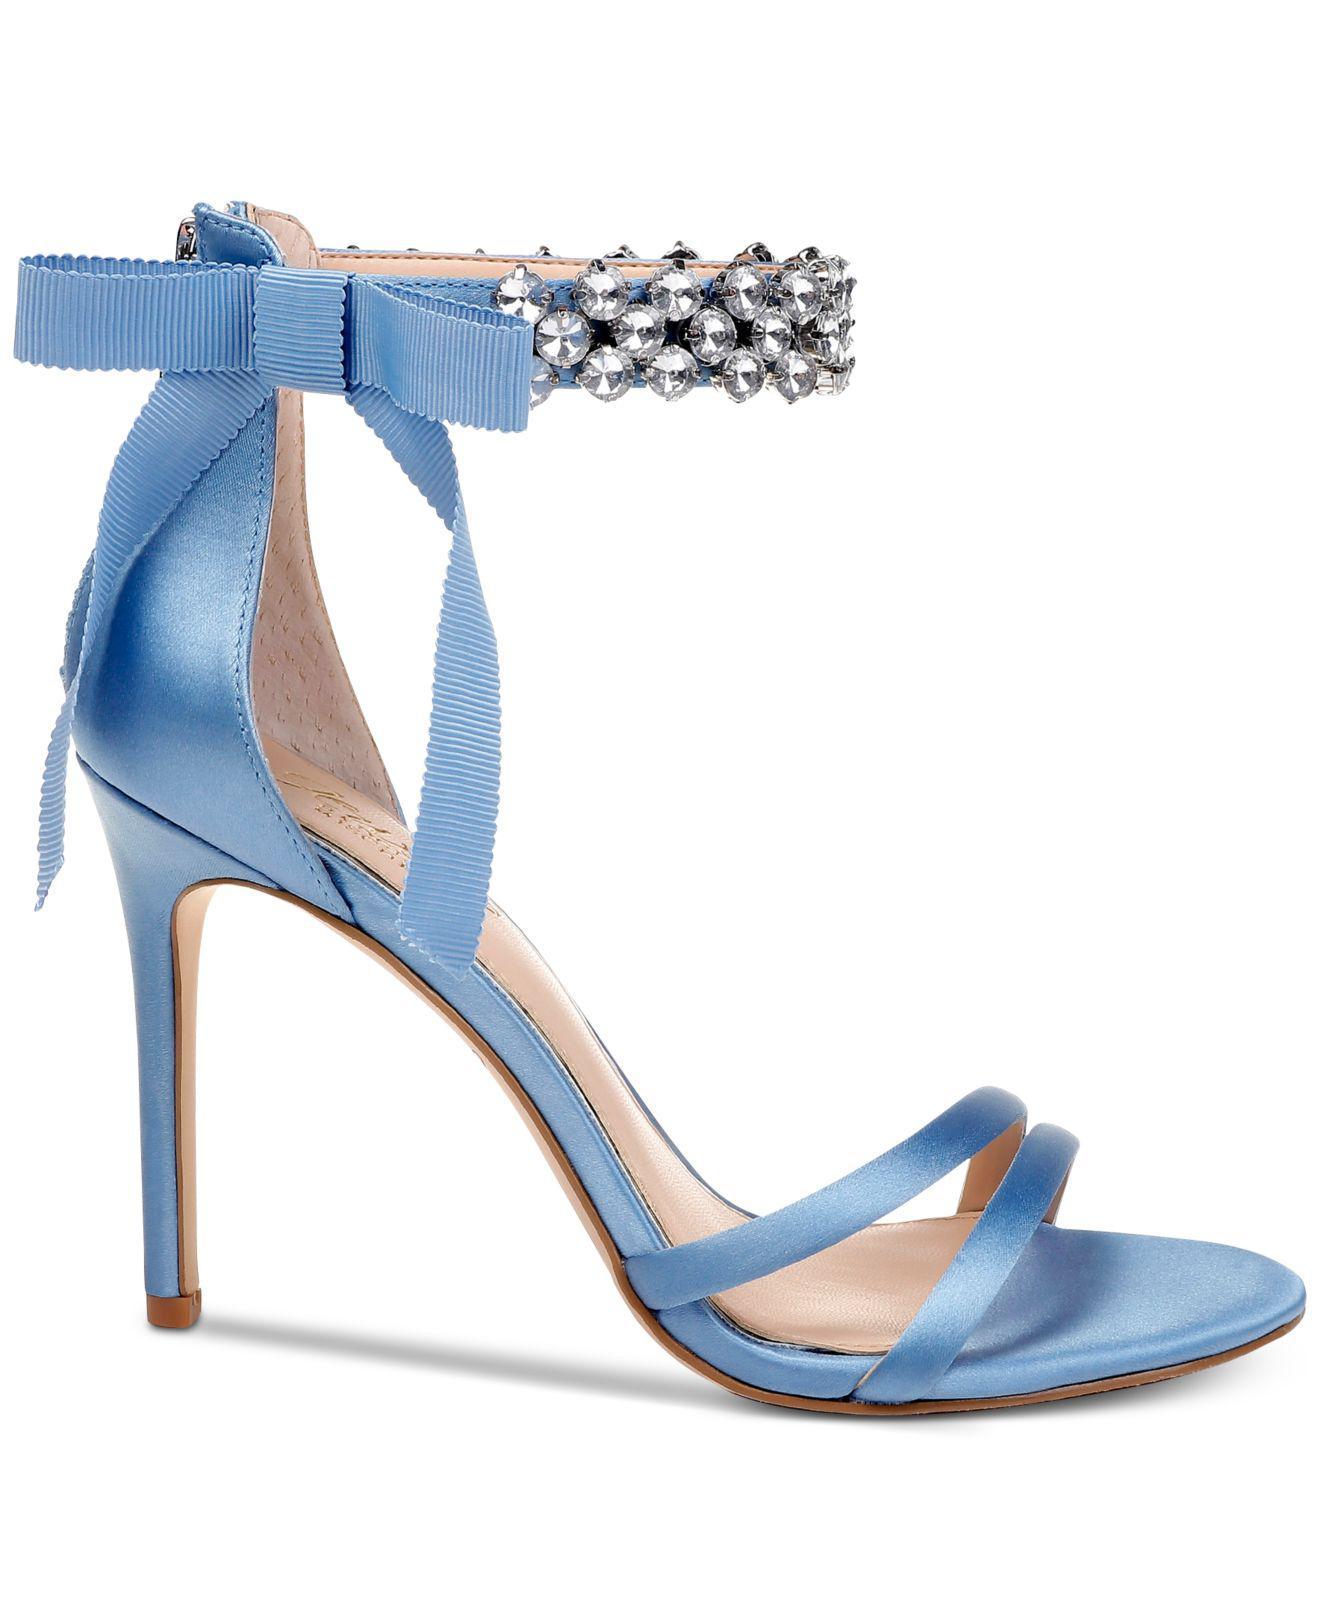 4a4e4d2d3 Badgley Mischka Debra Evening Sandals in Blue - Save 20% - Lyst